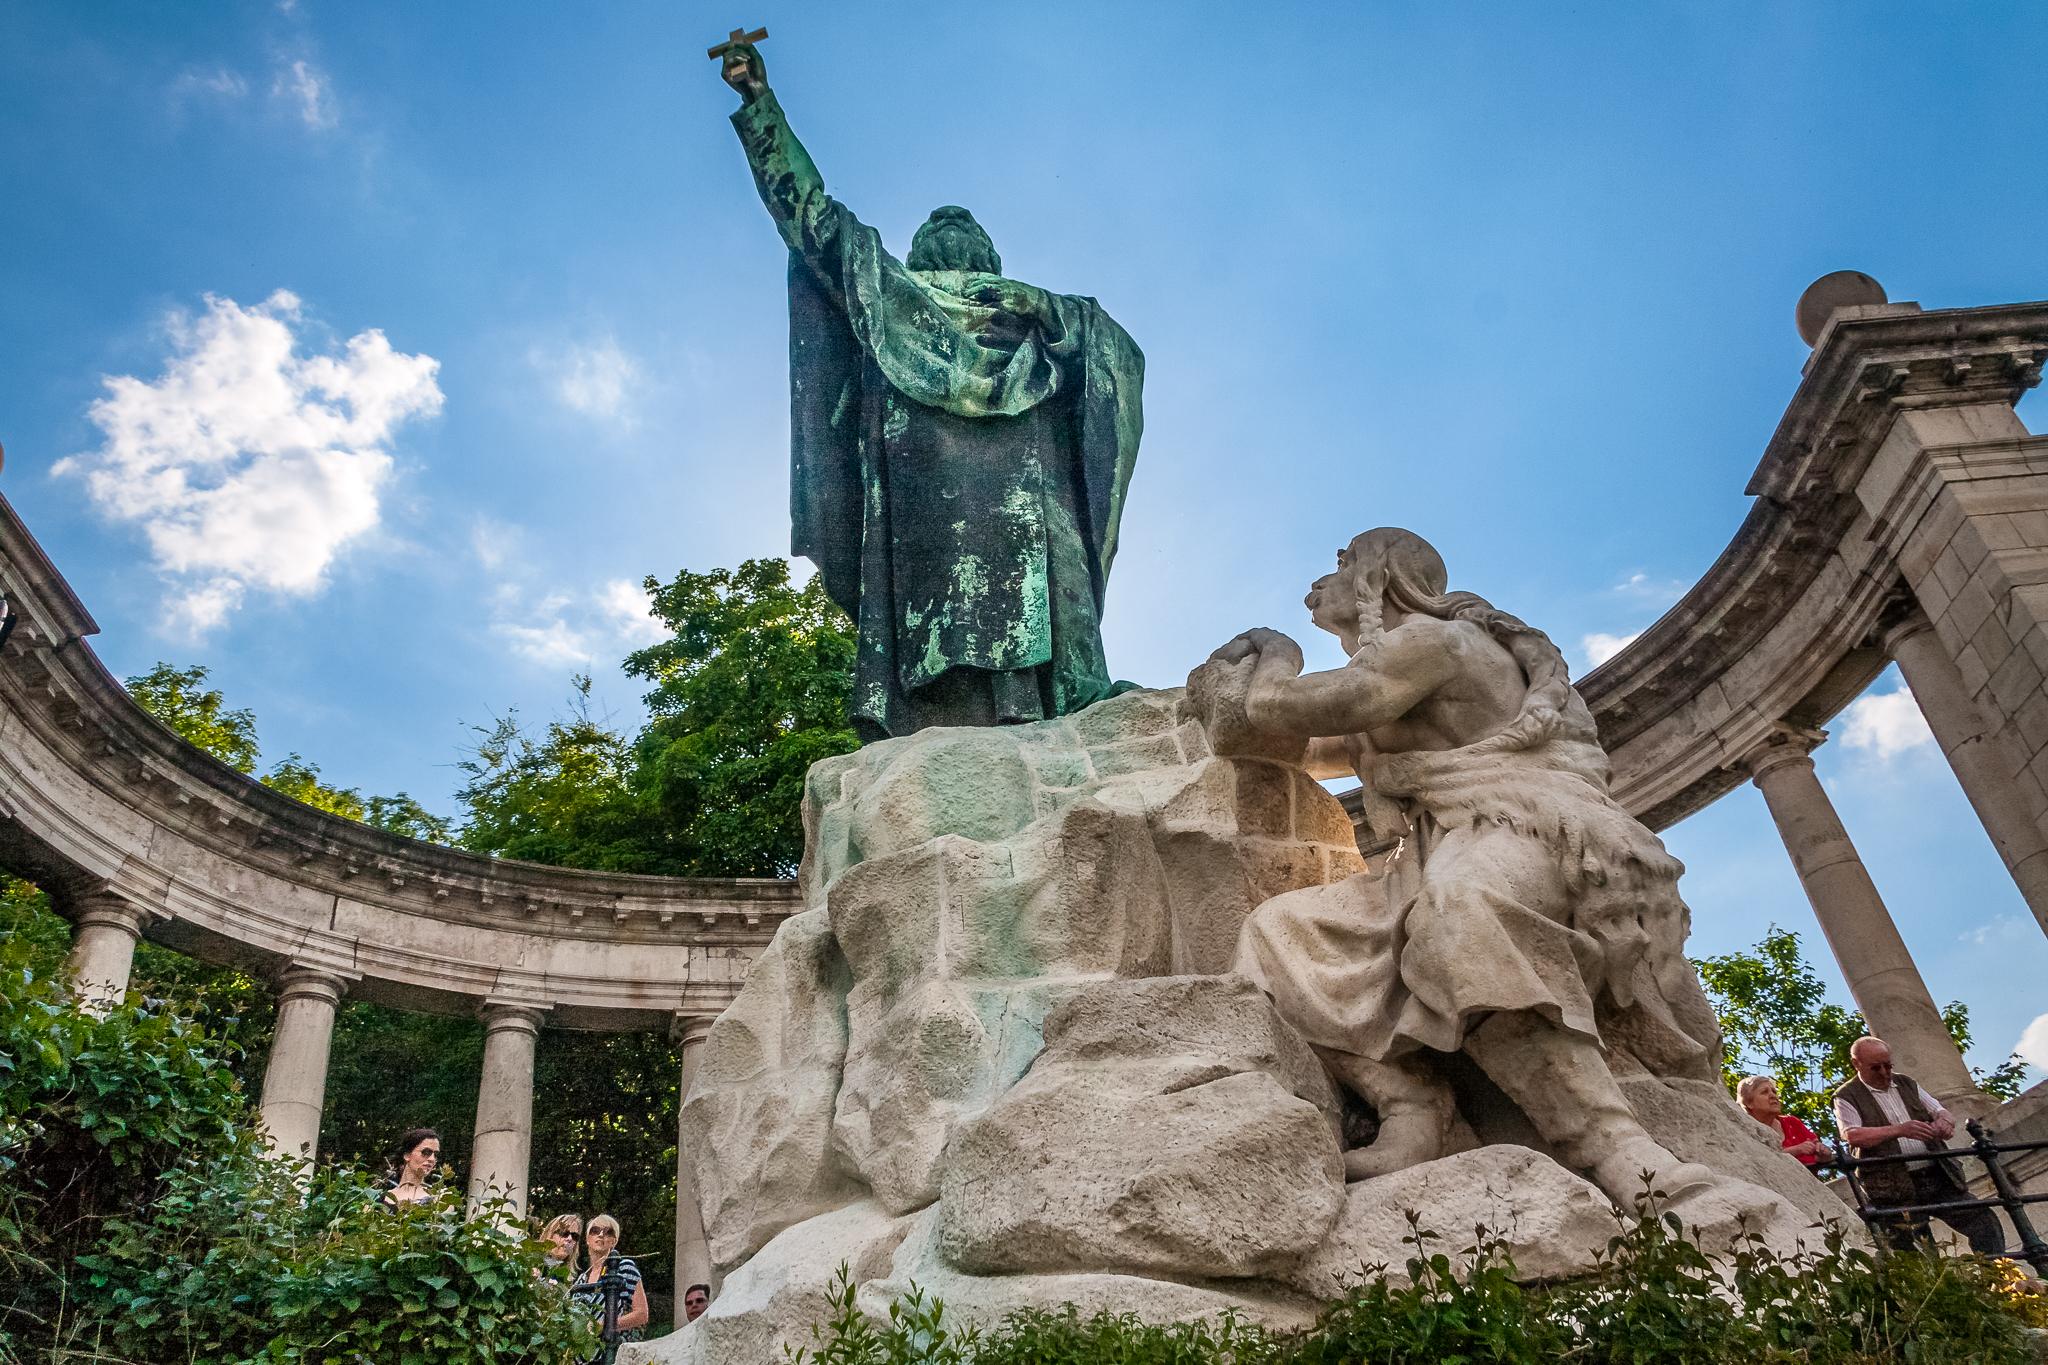 Statue of St Gellert